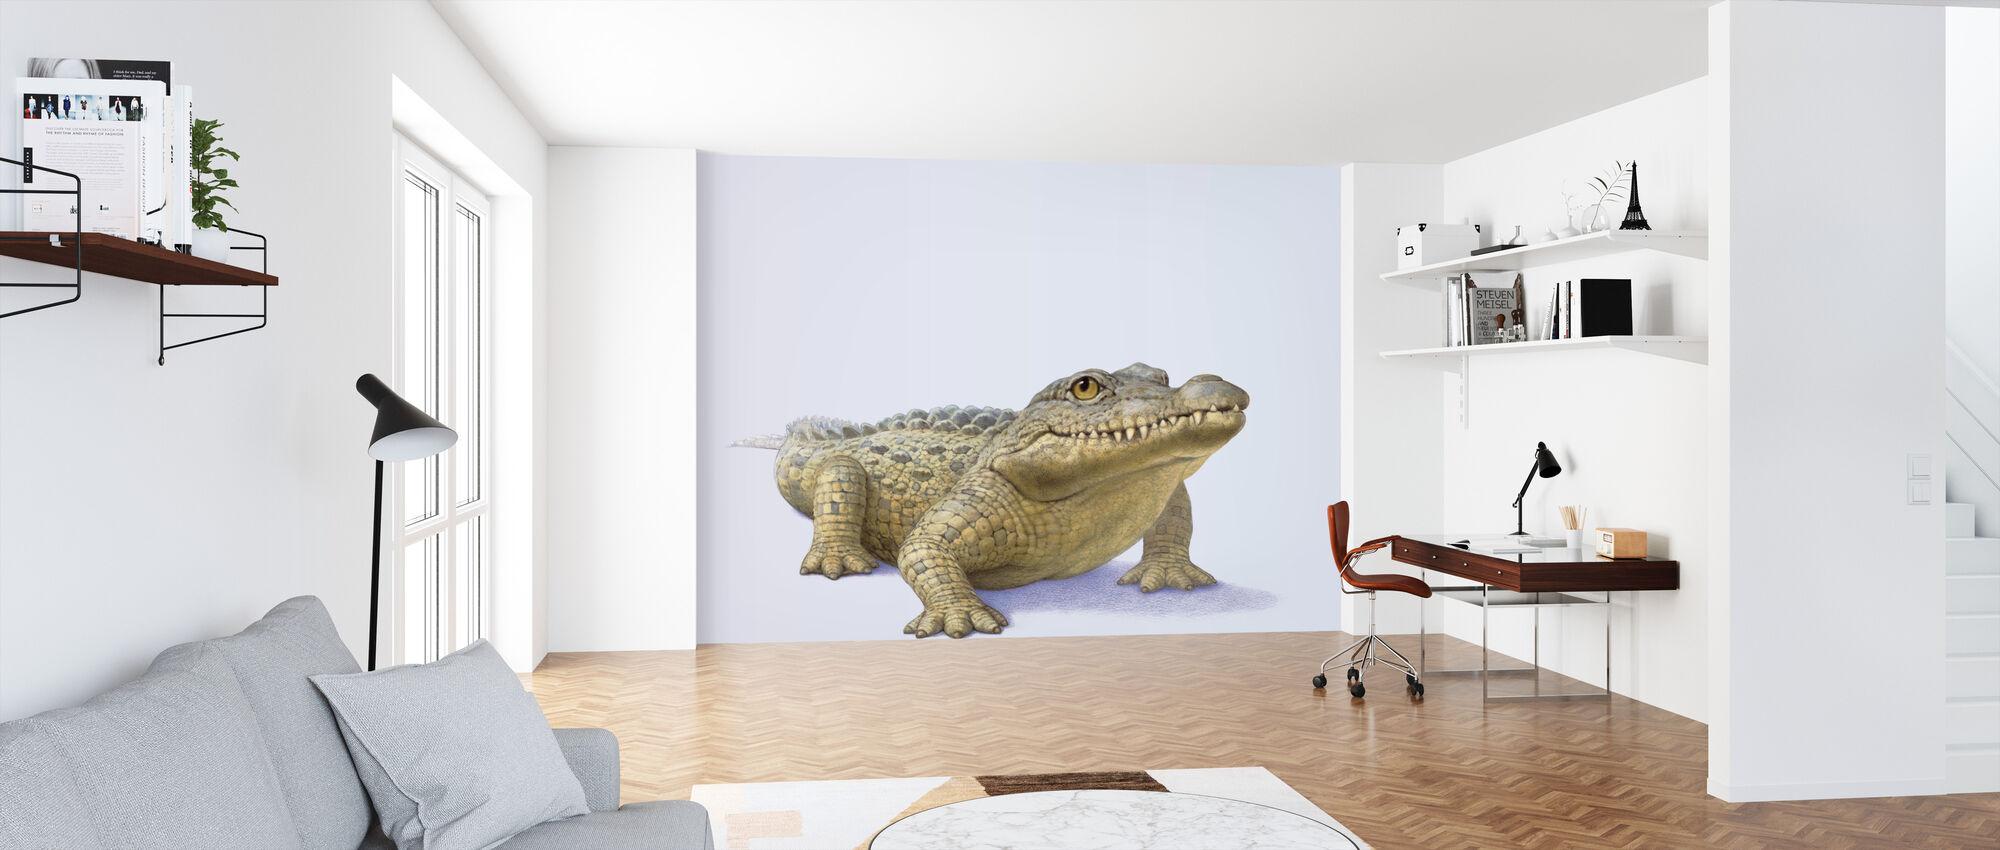 Crocodile Front - Wallpaper - Office